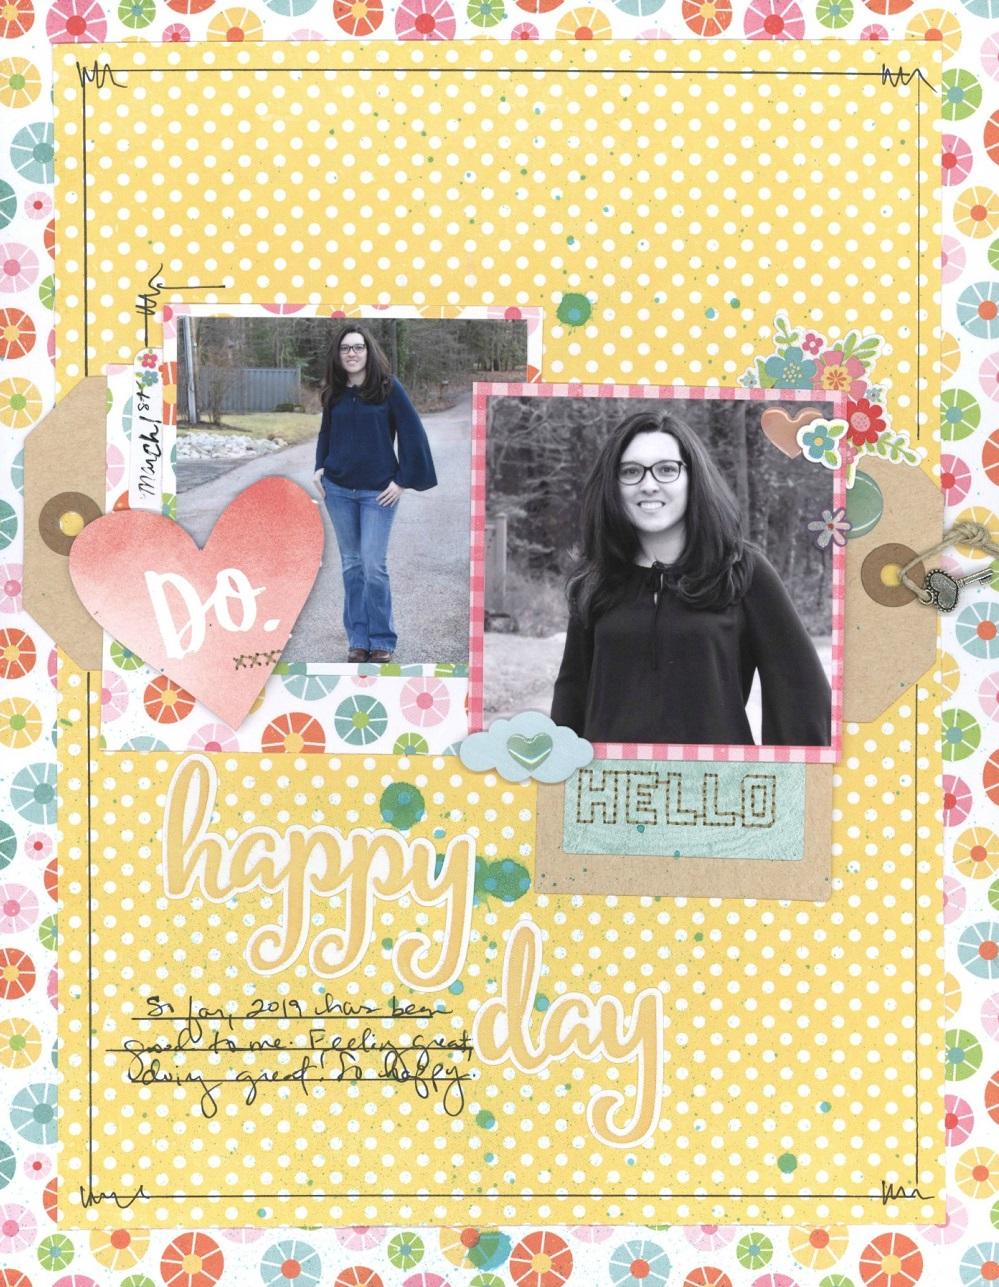 ScrapbookingStore - Nicole Martel using the March Kit